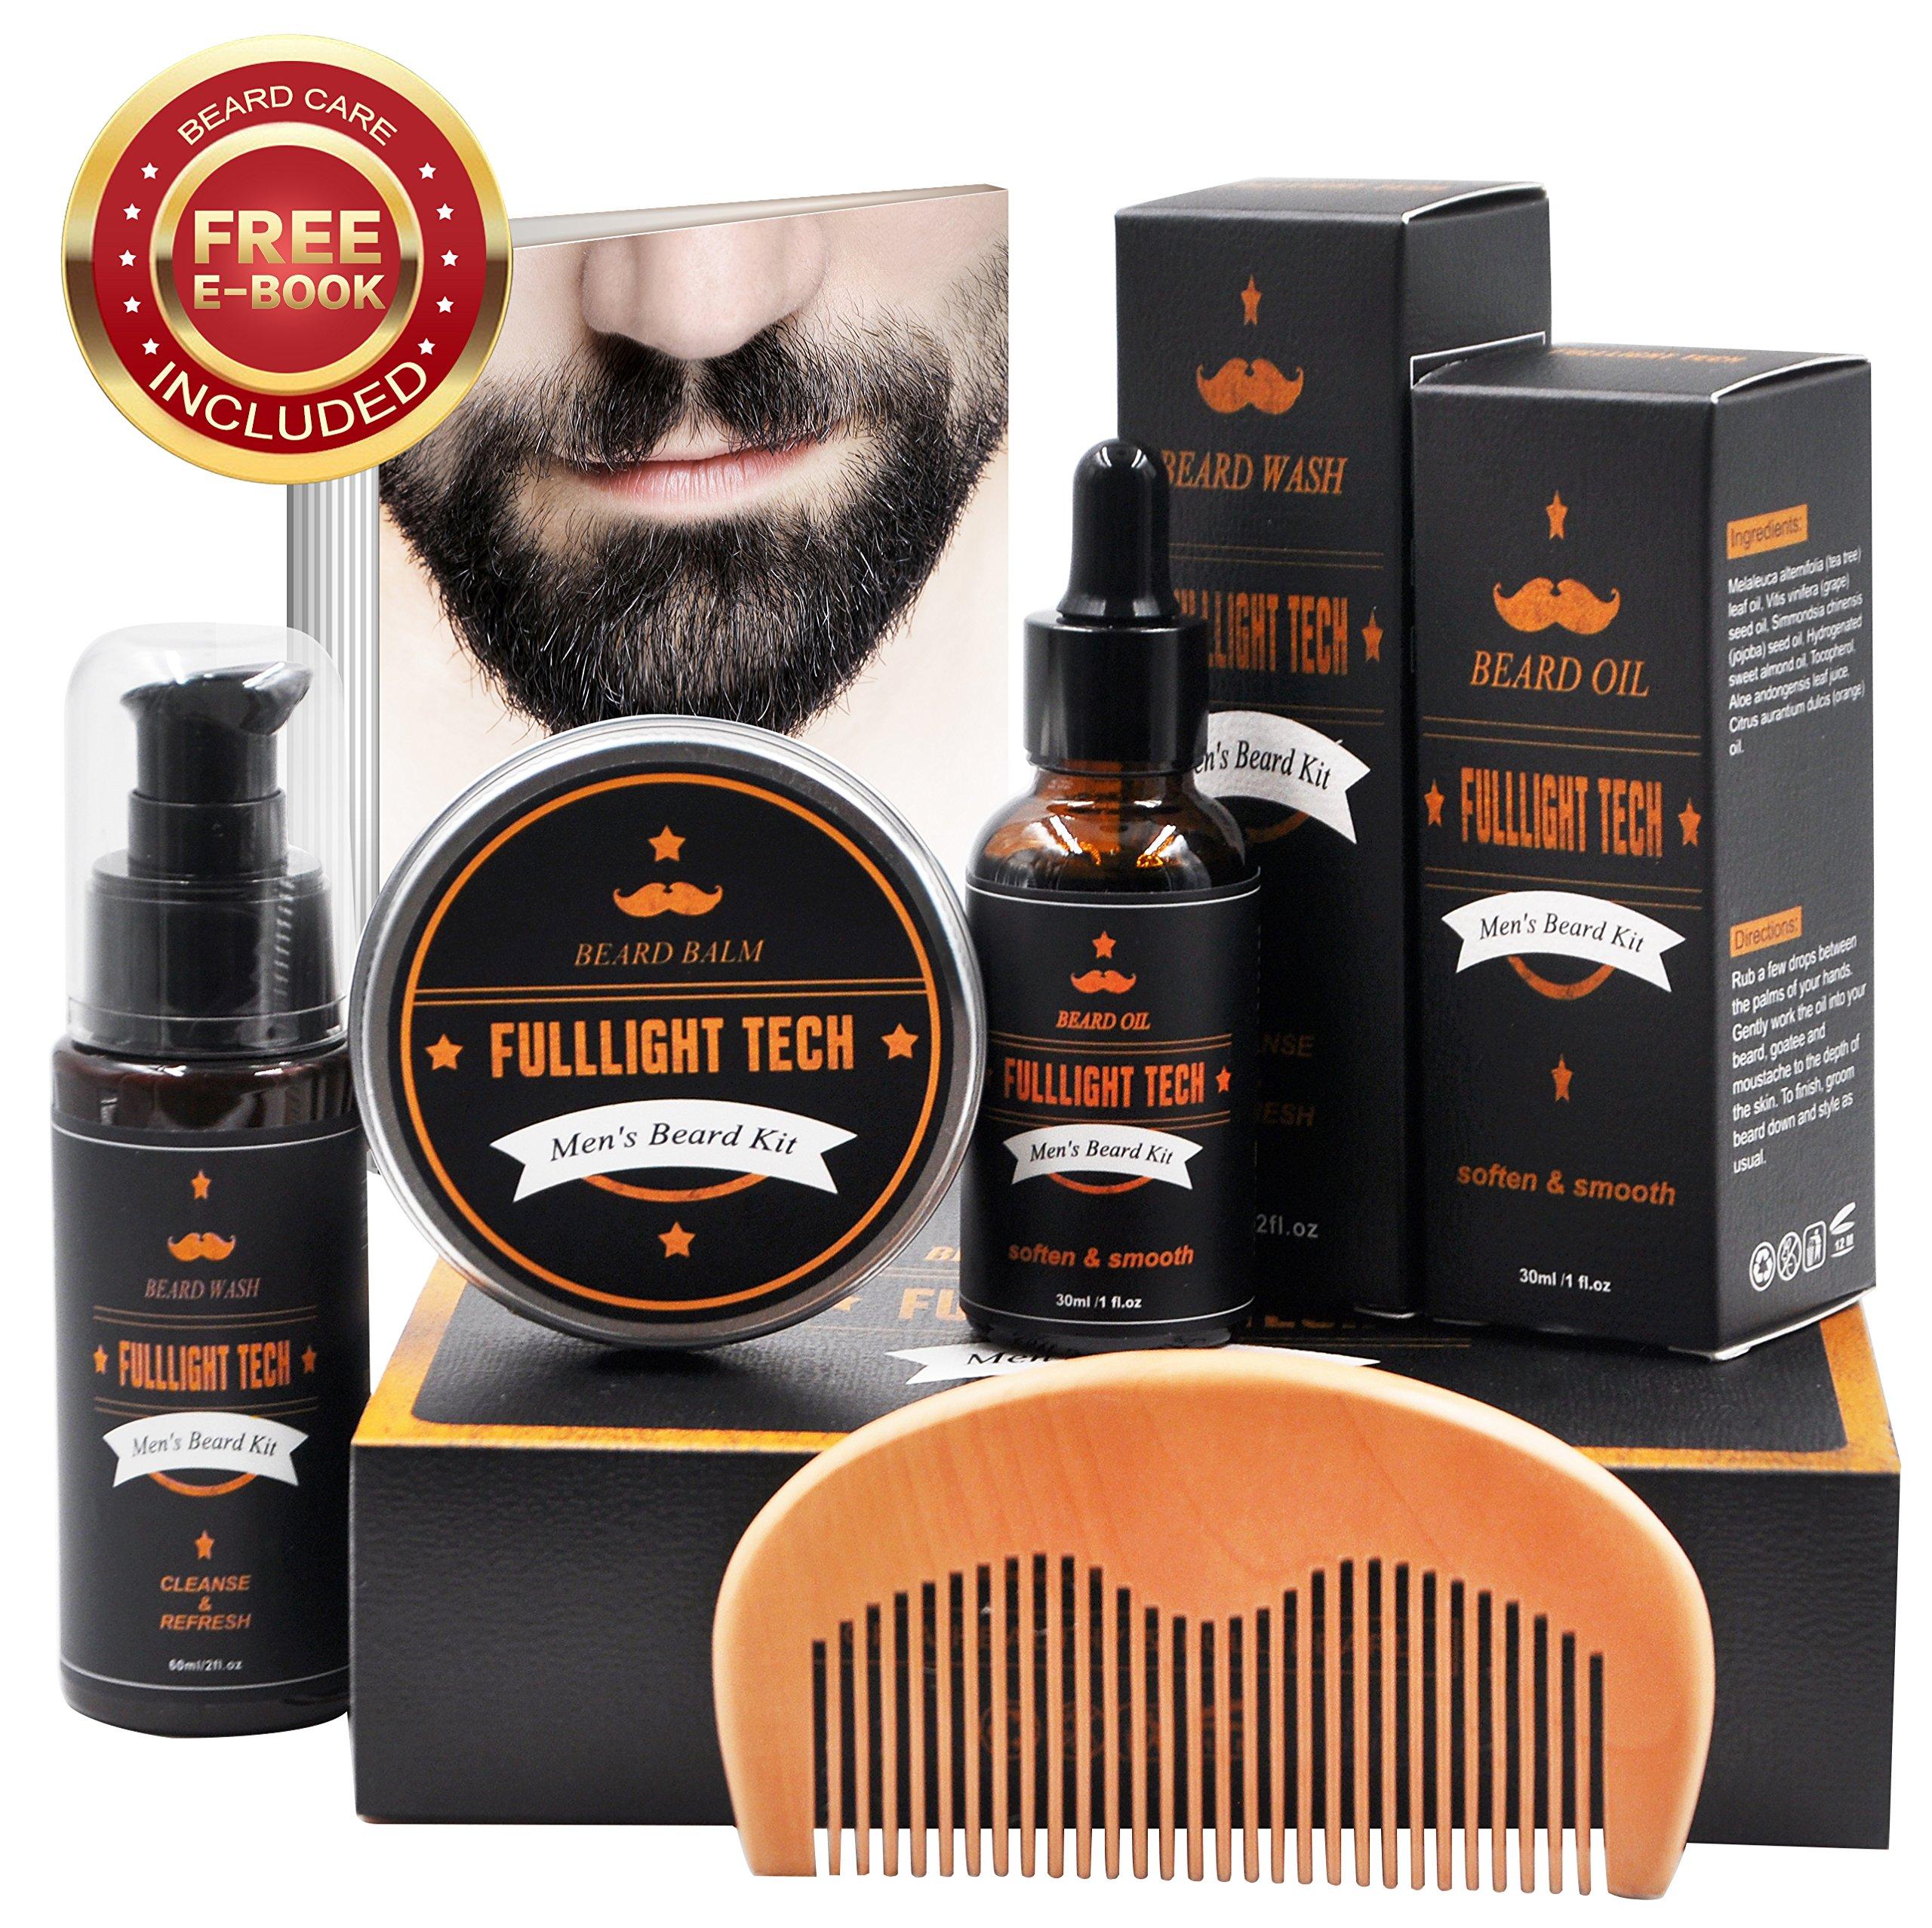 Beard Grooming Kit for Men/Dad/Husband Beard Growth Gift Sets with Unscented Beard Softening Oil Conditioner+Mustache Balm+Beard Shampoo/Wash+Beard Comb 100% Natural for Moisturizing (Beard Kit)